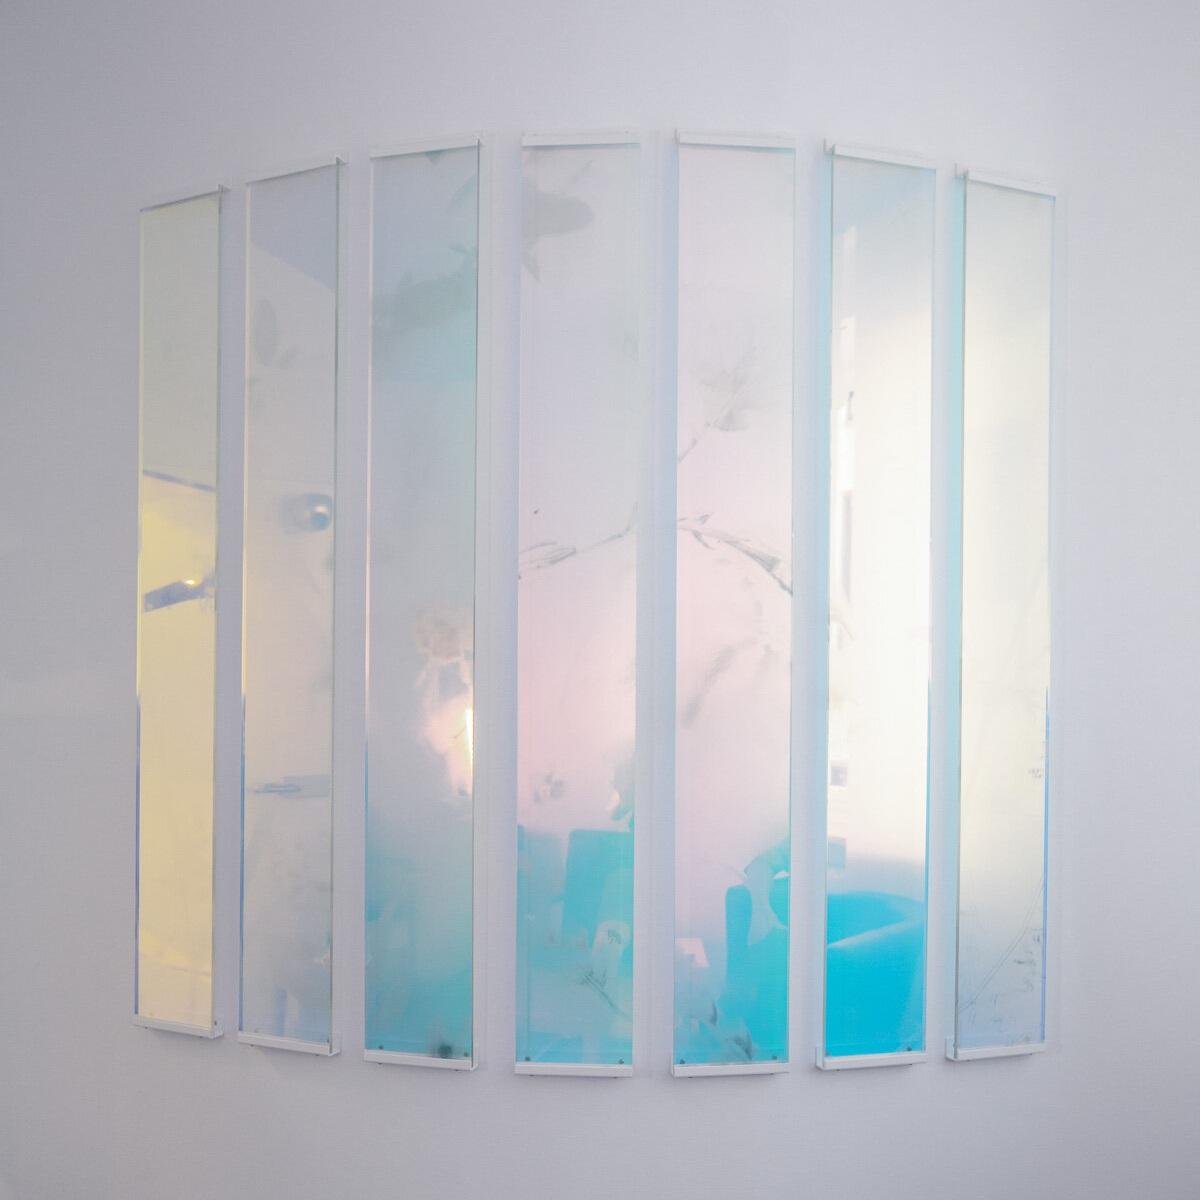 Zahnarzt-Praxis-Doerthe-Fischer-Wuerzburg-kunst-installation-michael-acapulco-1169-2.jpg